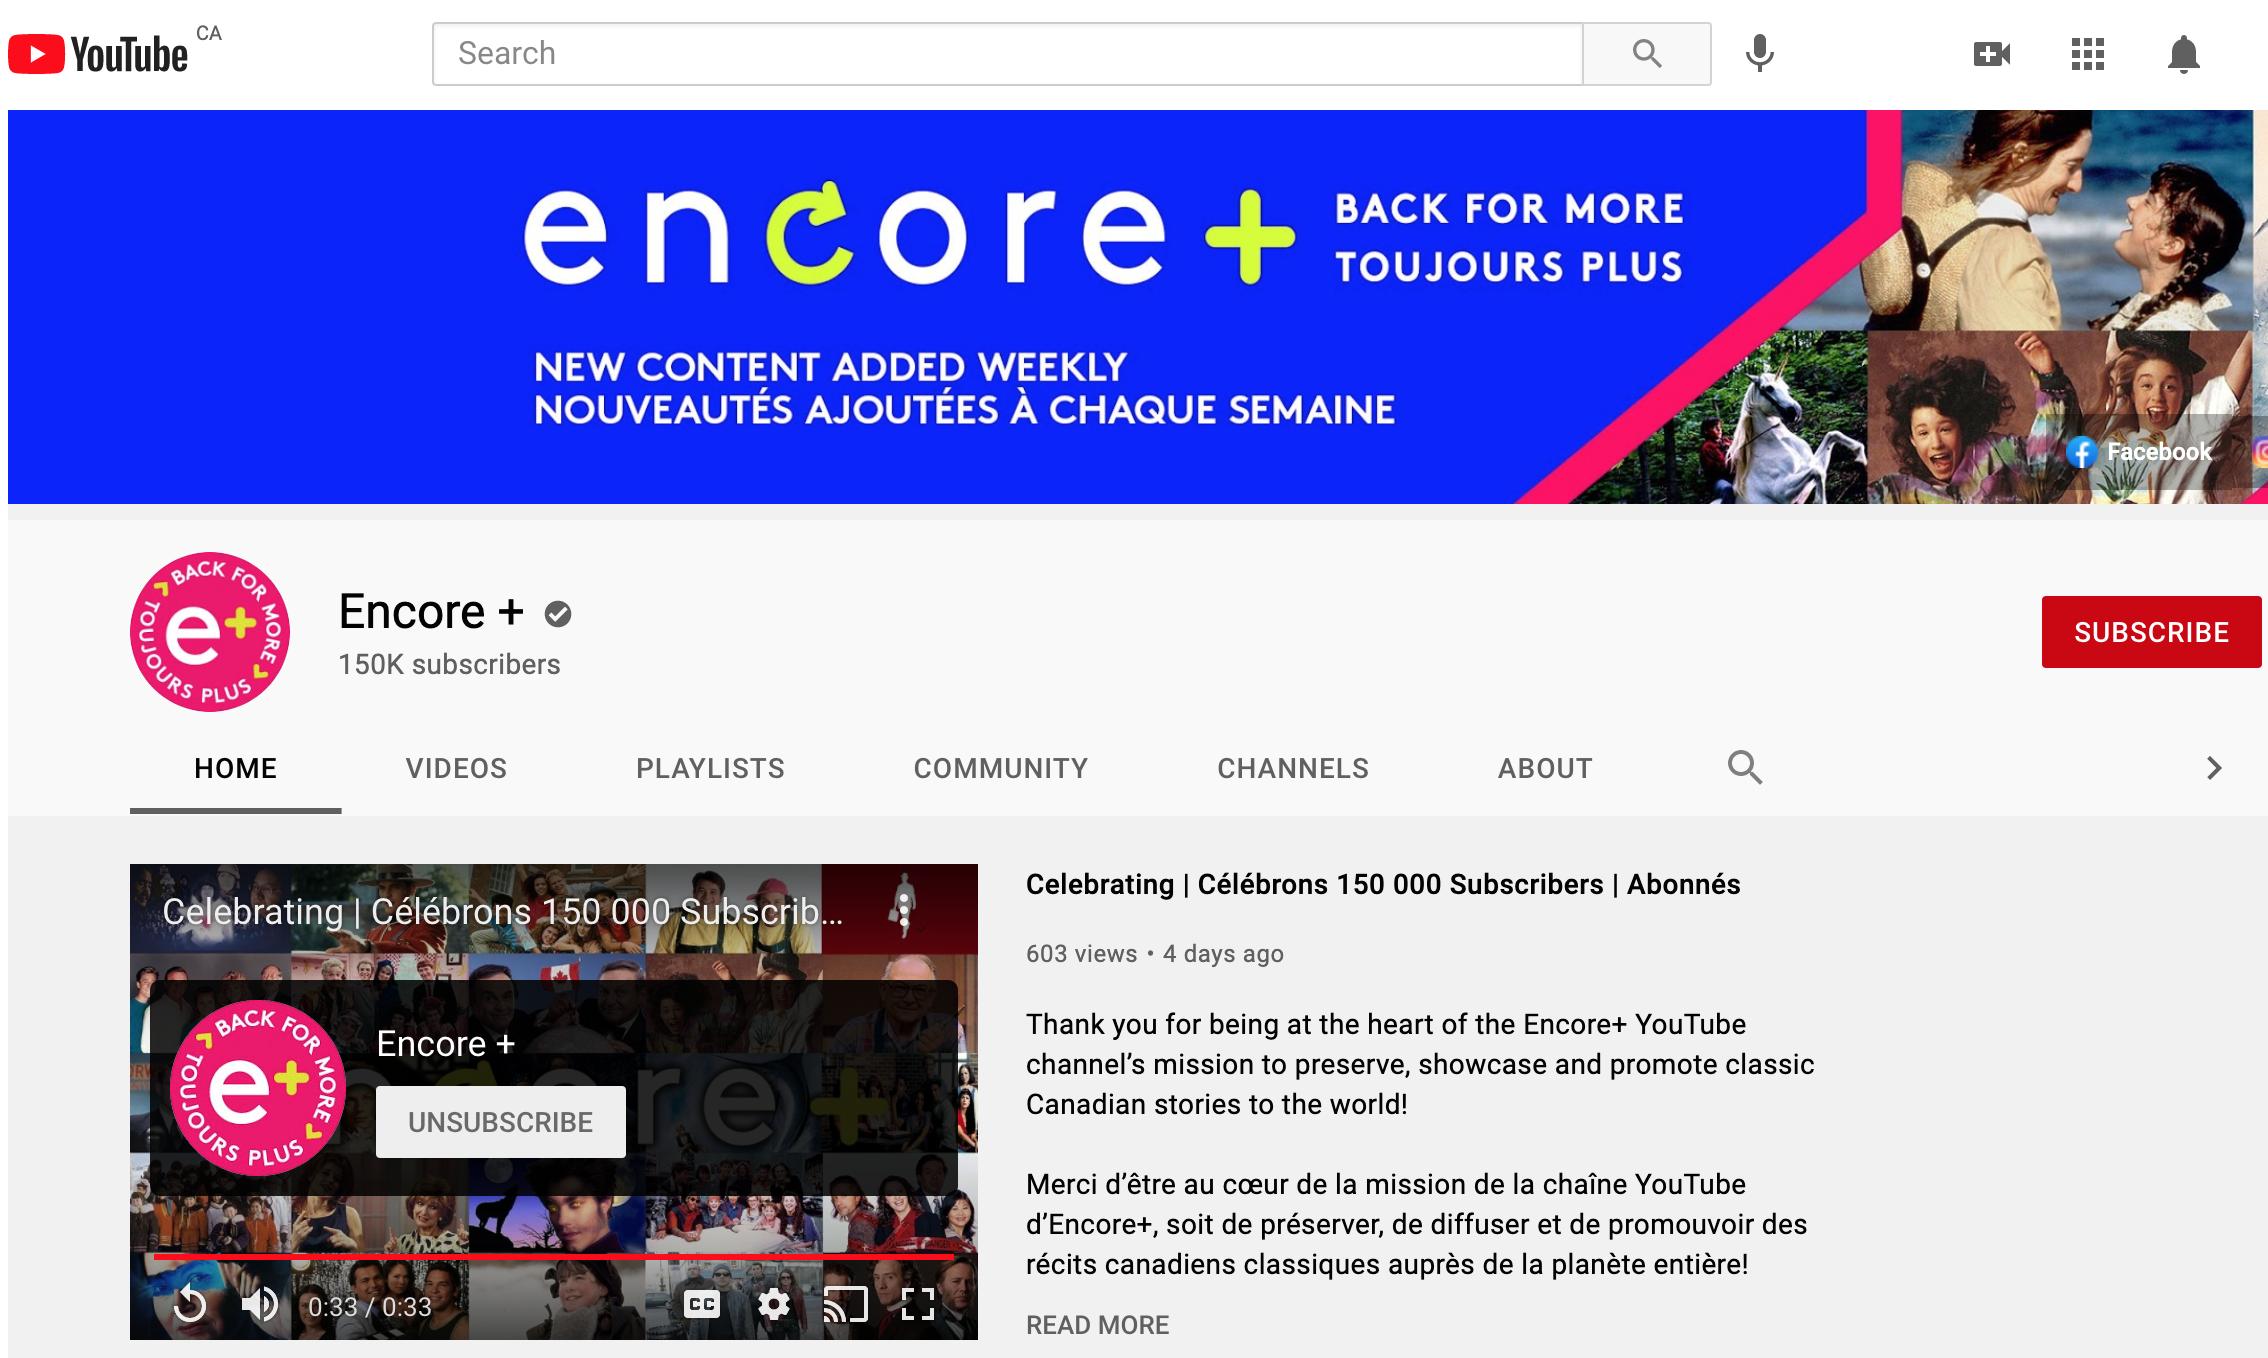 Encore+